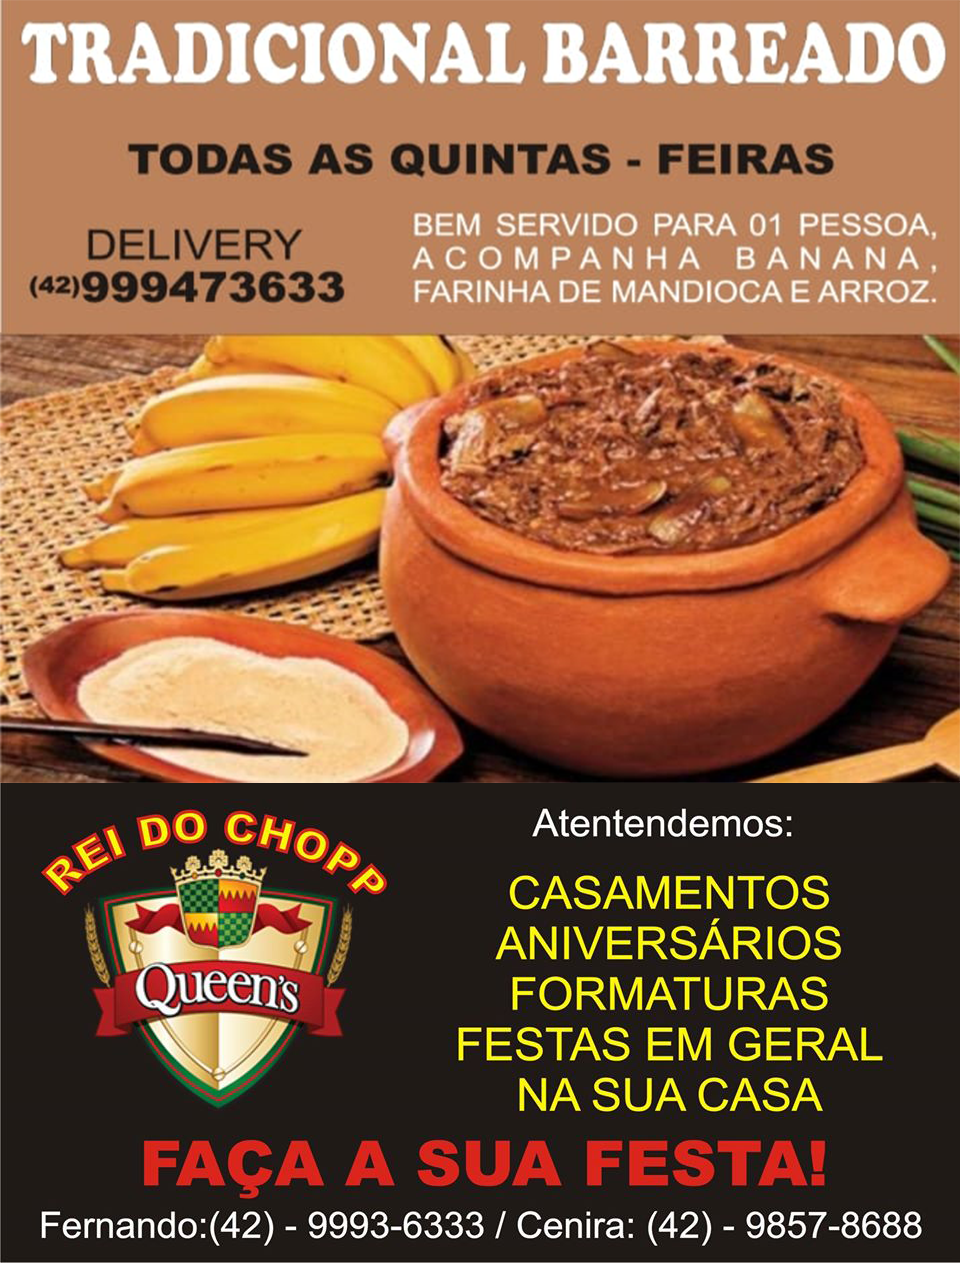 REI DO CHOP